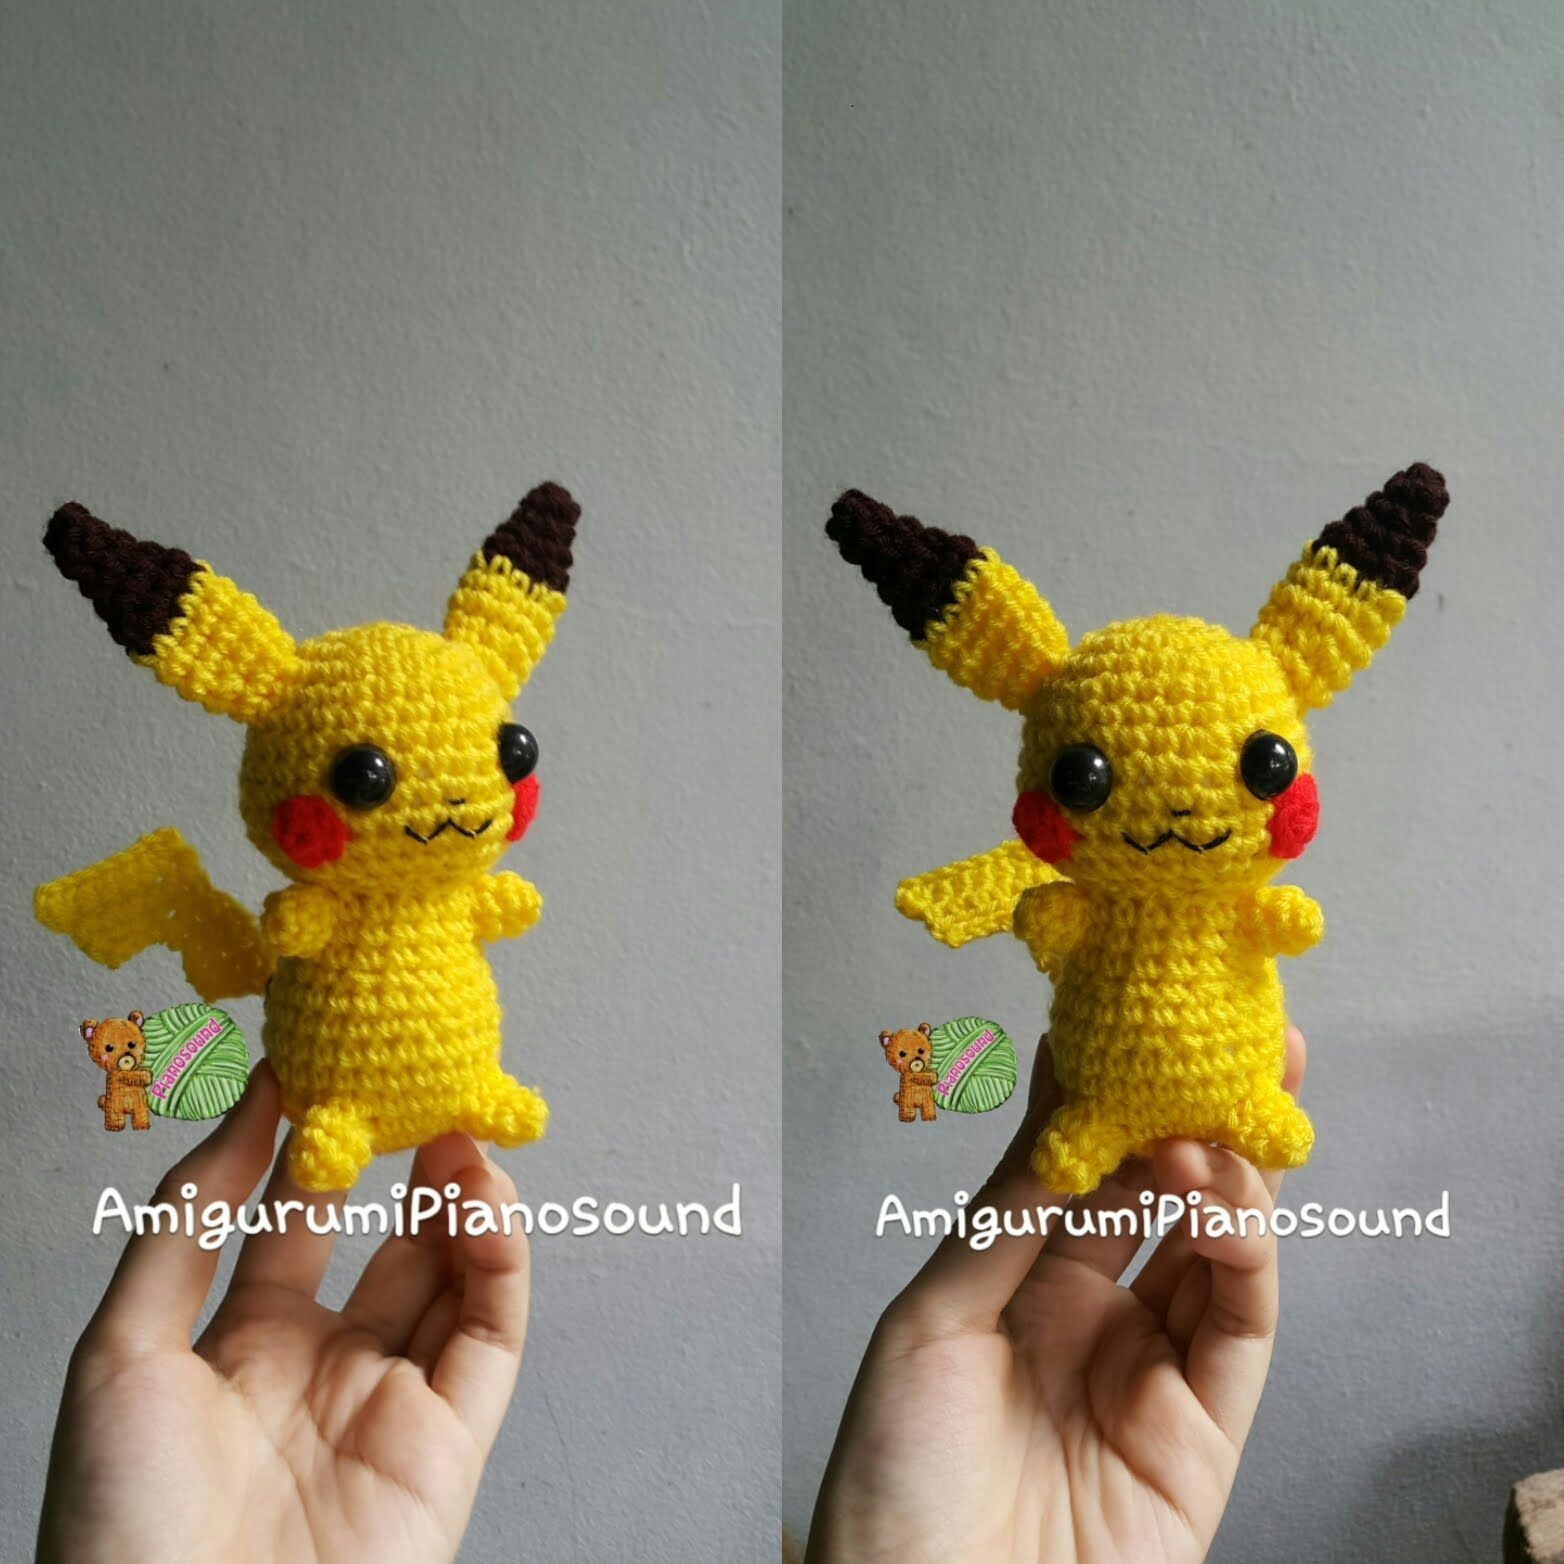 Pikachu Pokemon Crochet Tutorial | Presents For Others | Pinterest ...